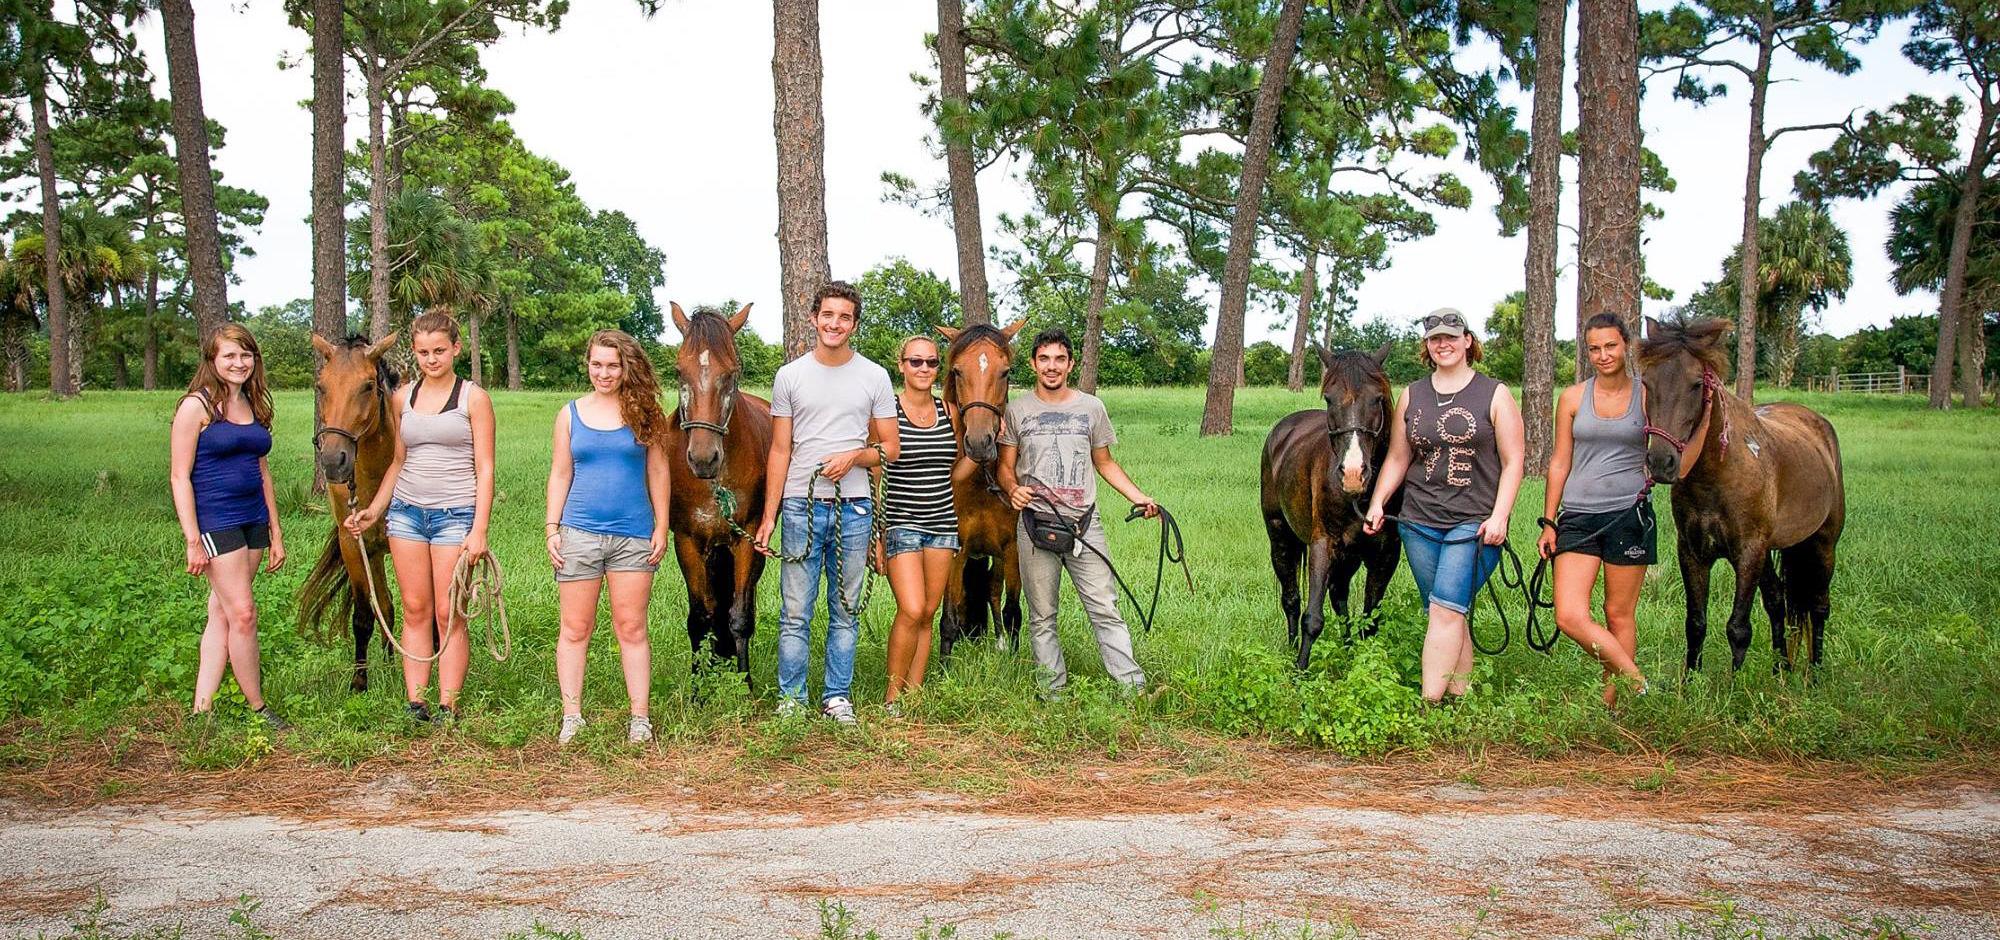 Volunteering in Florida